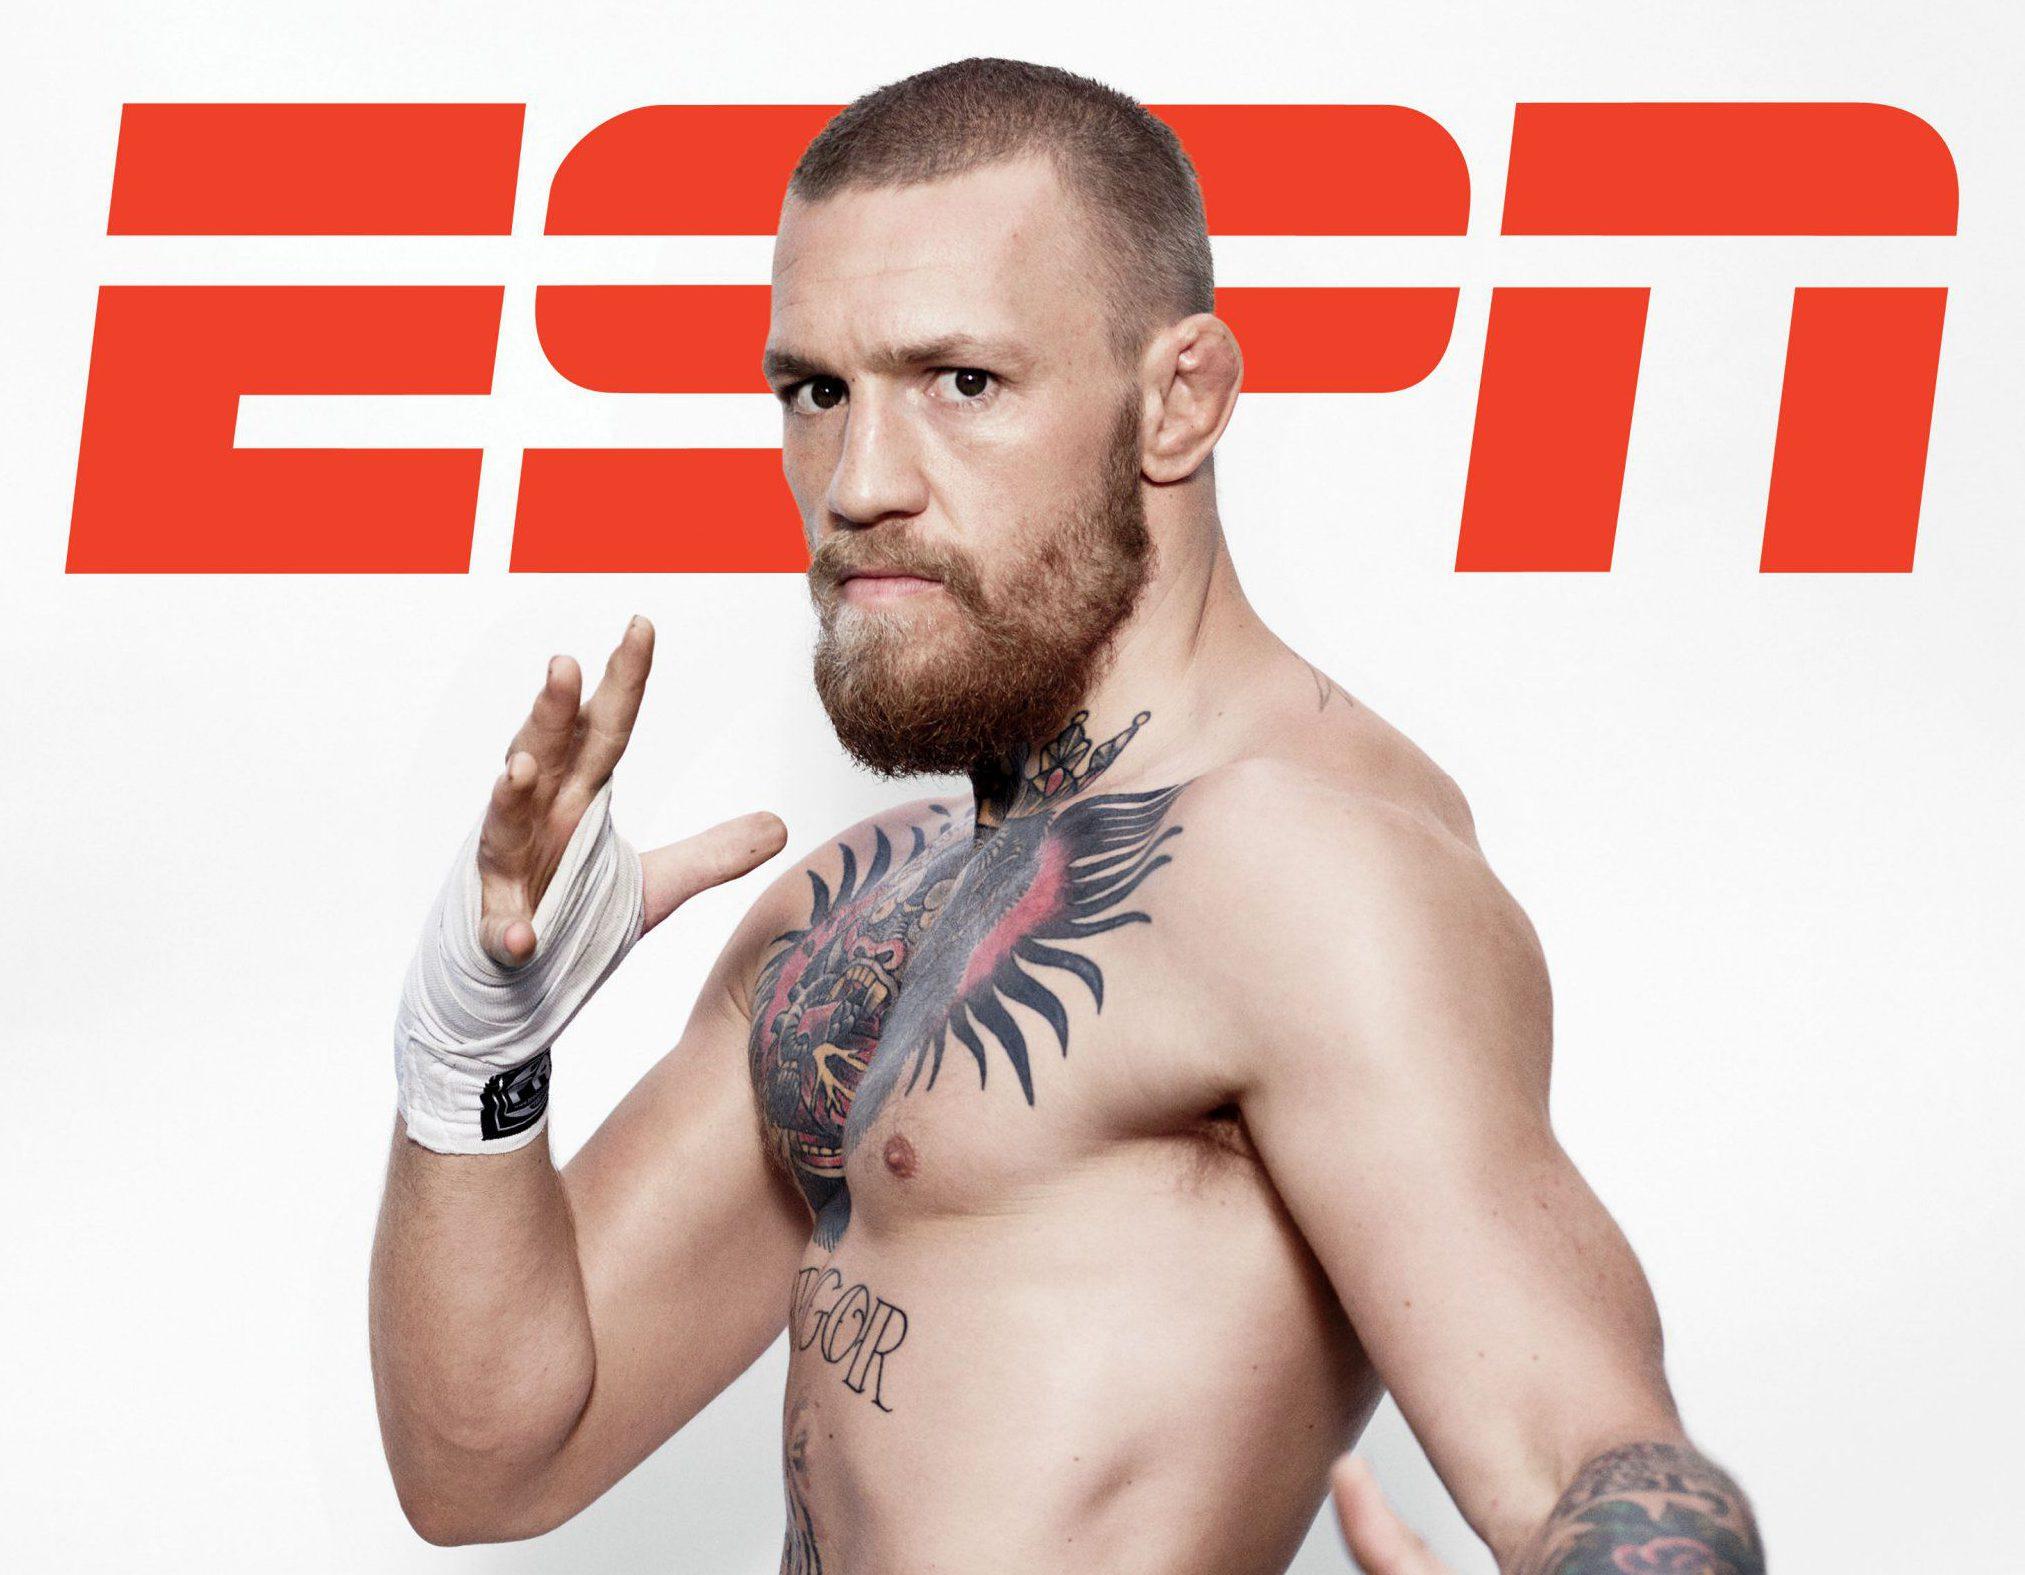 ESPN BODY ISSUE Conor McGregor.jpg CREDIT MARK SELIGER